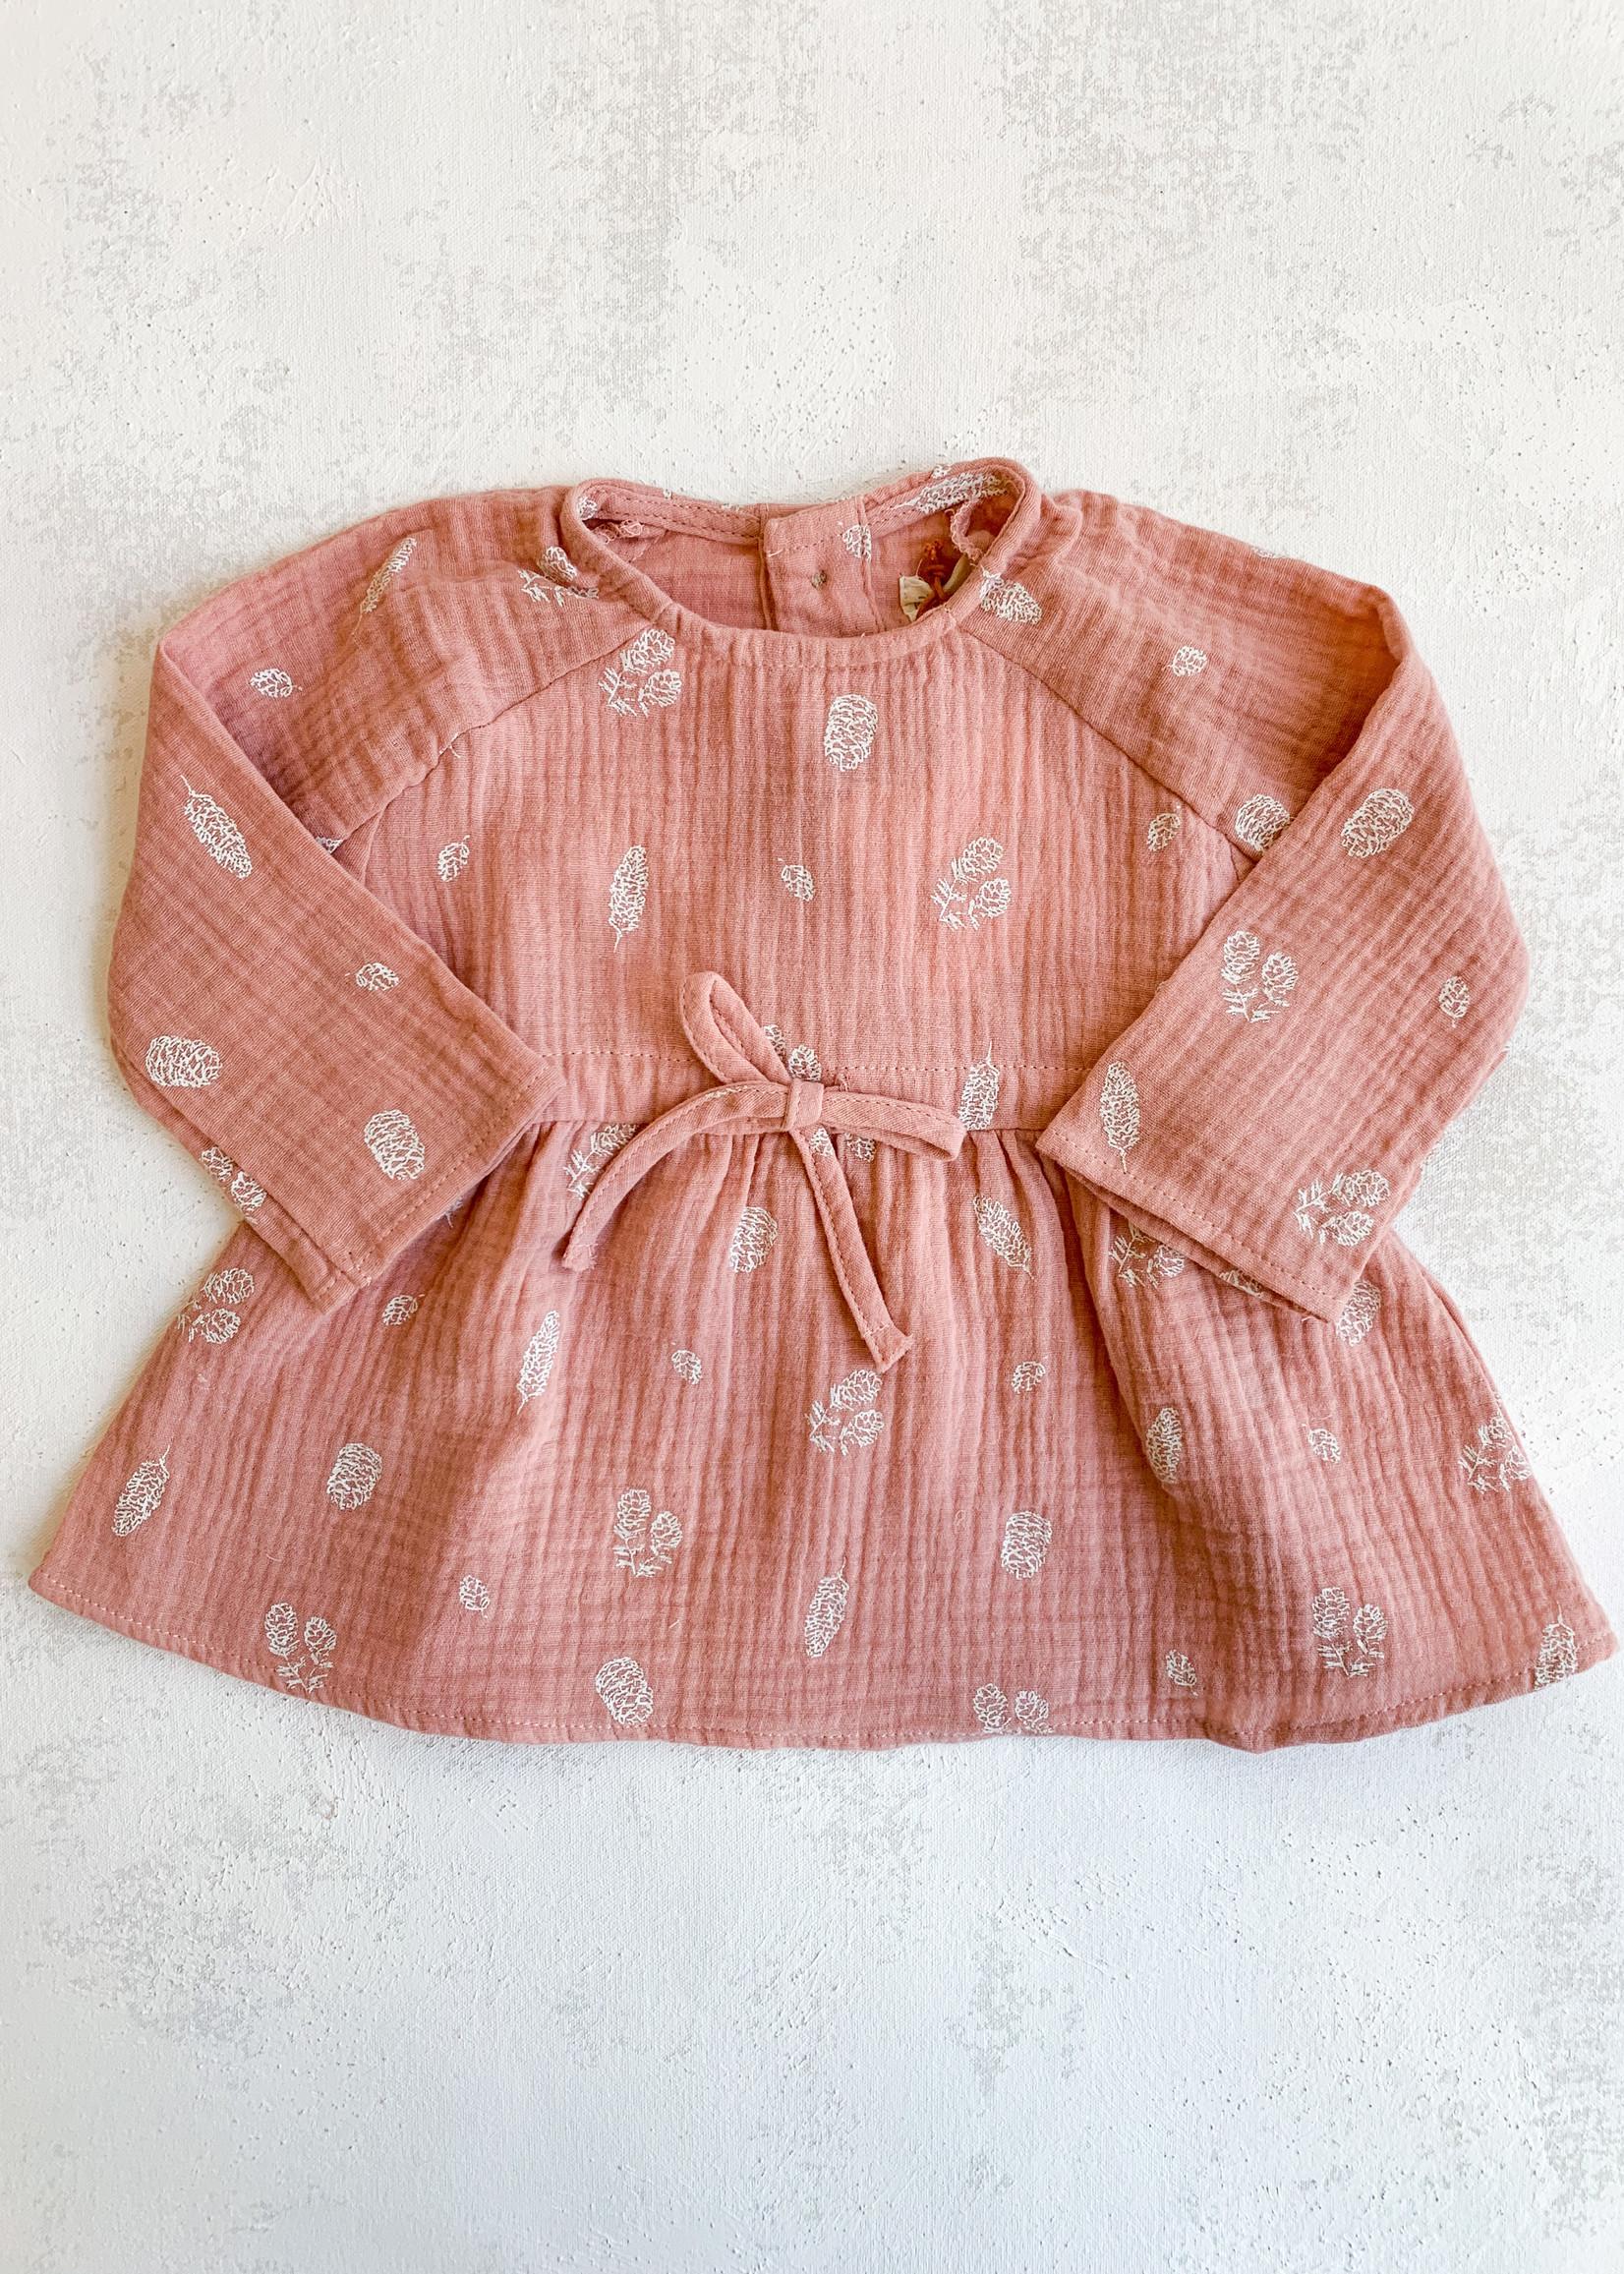 Elitaire Petite Marnie Pink Pinecone Dress